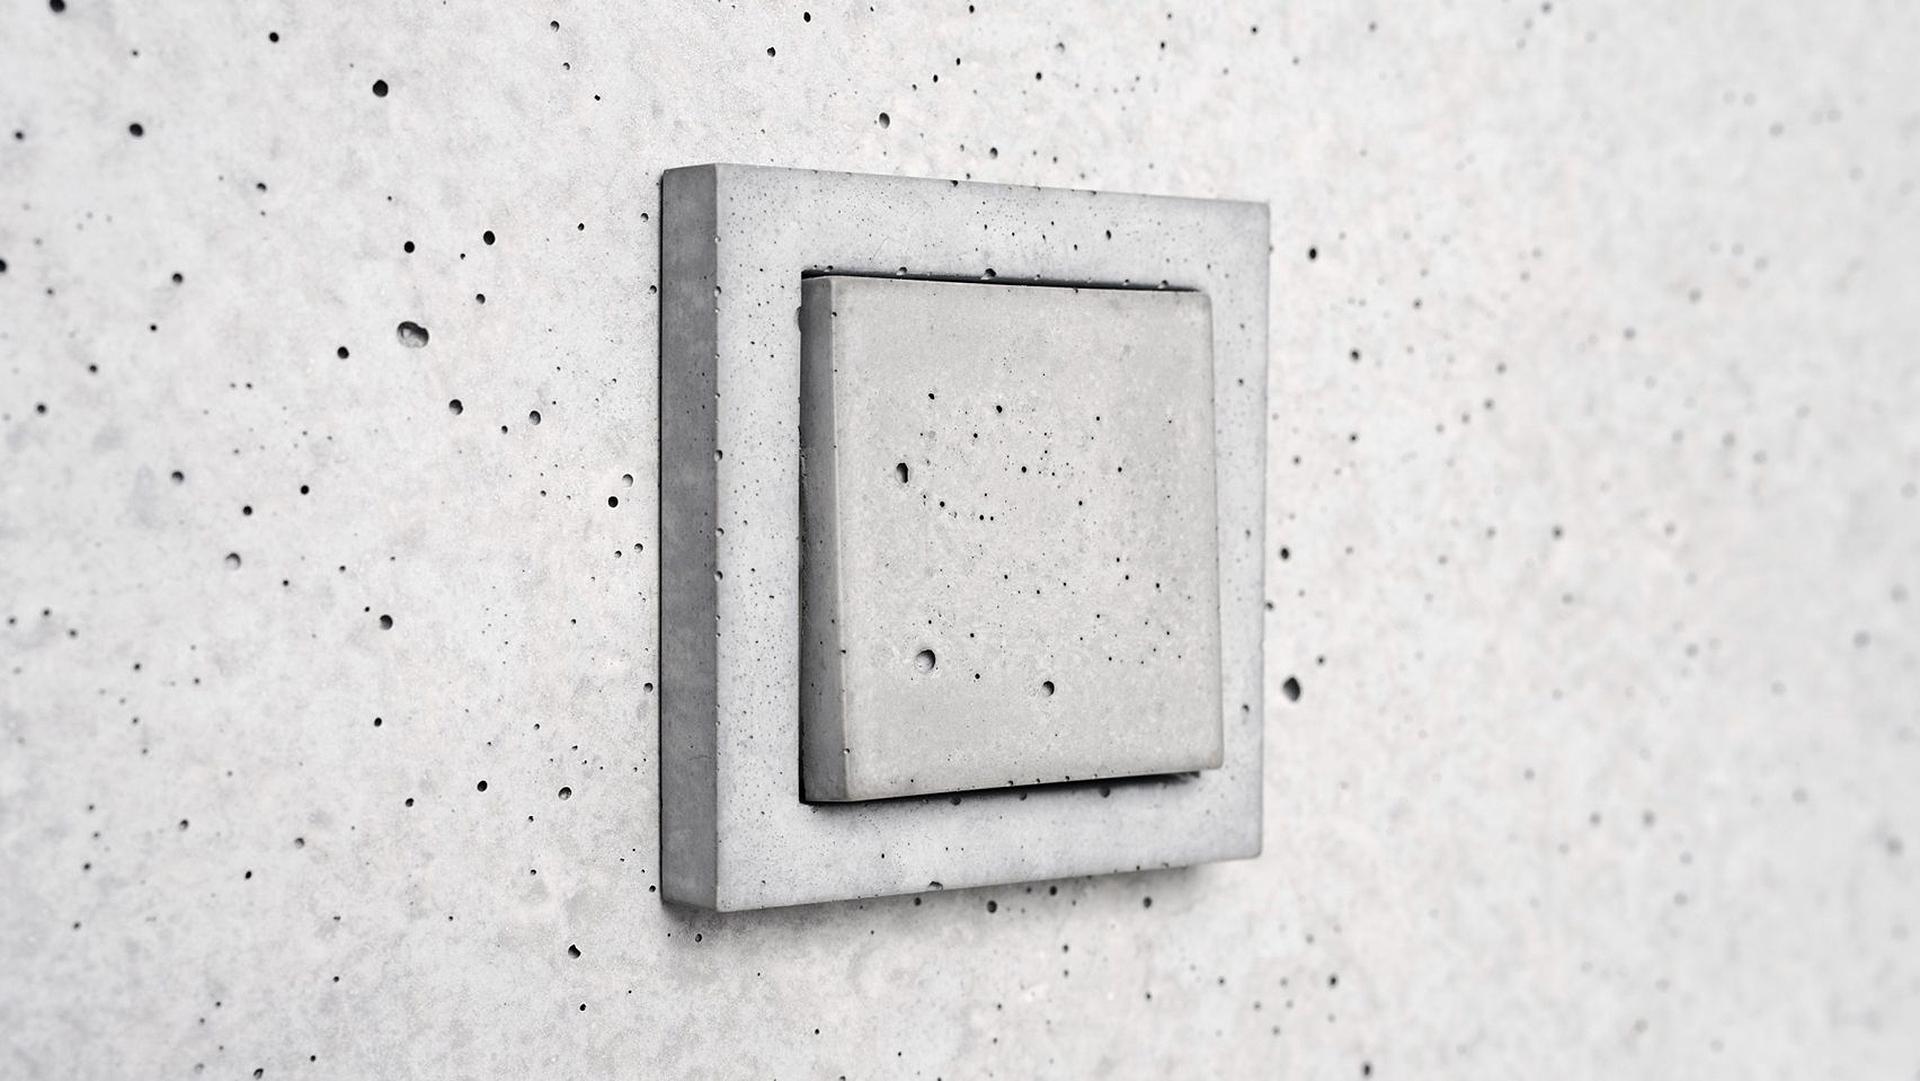 Бетон не горит плесень бетон